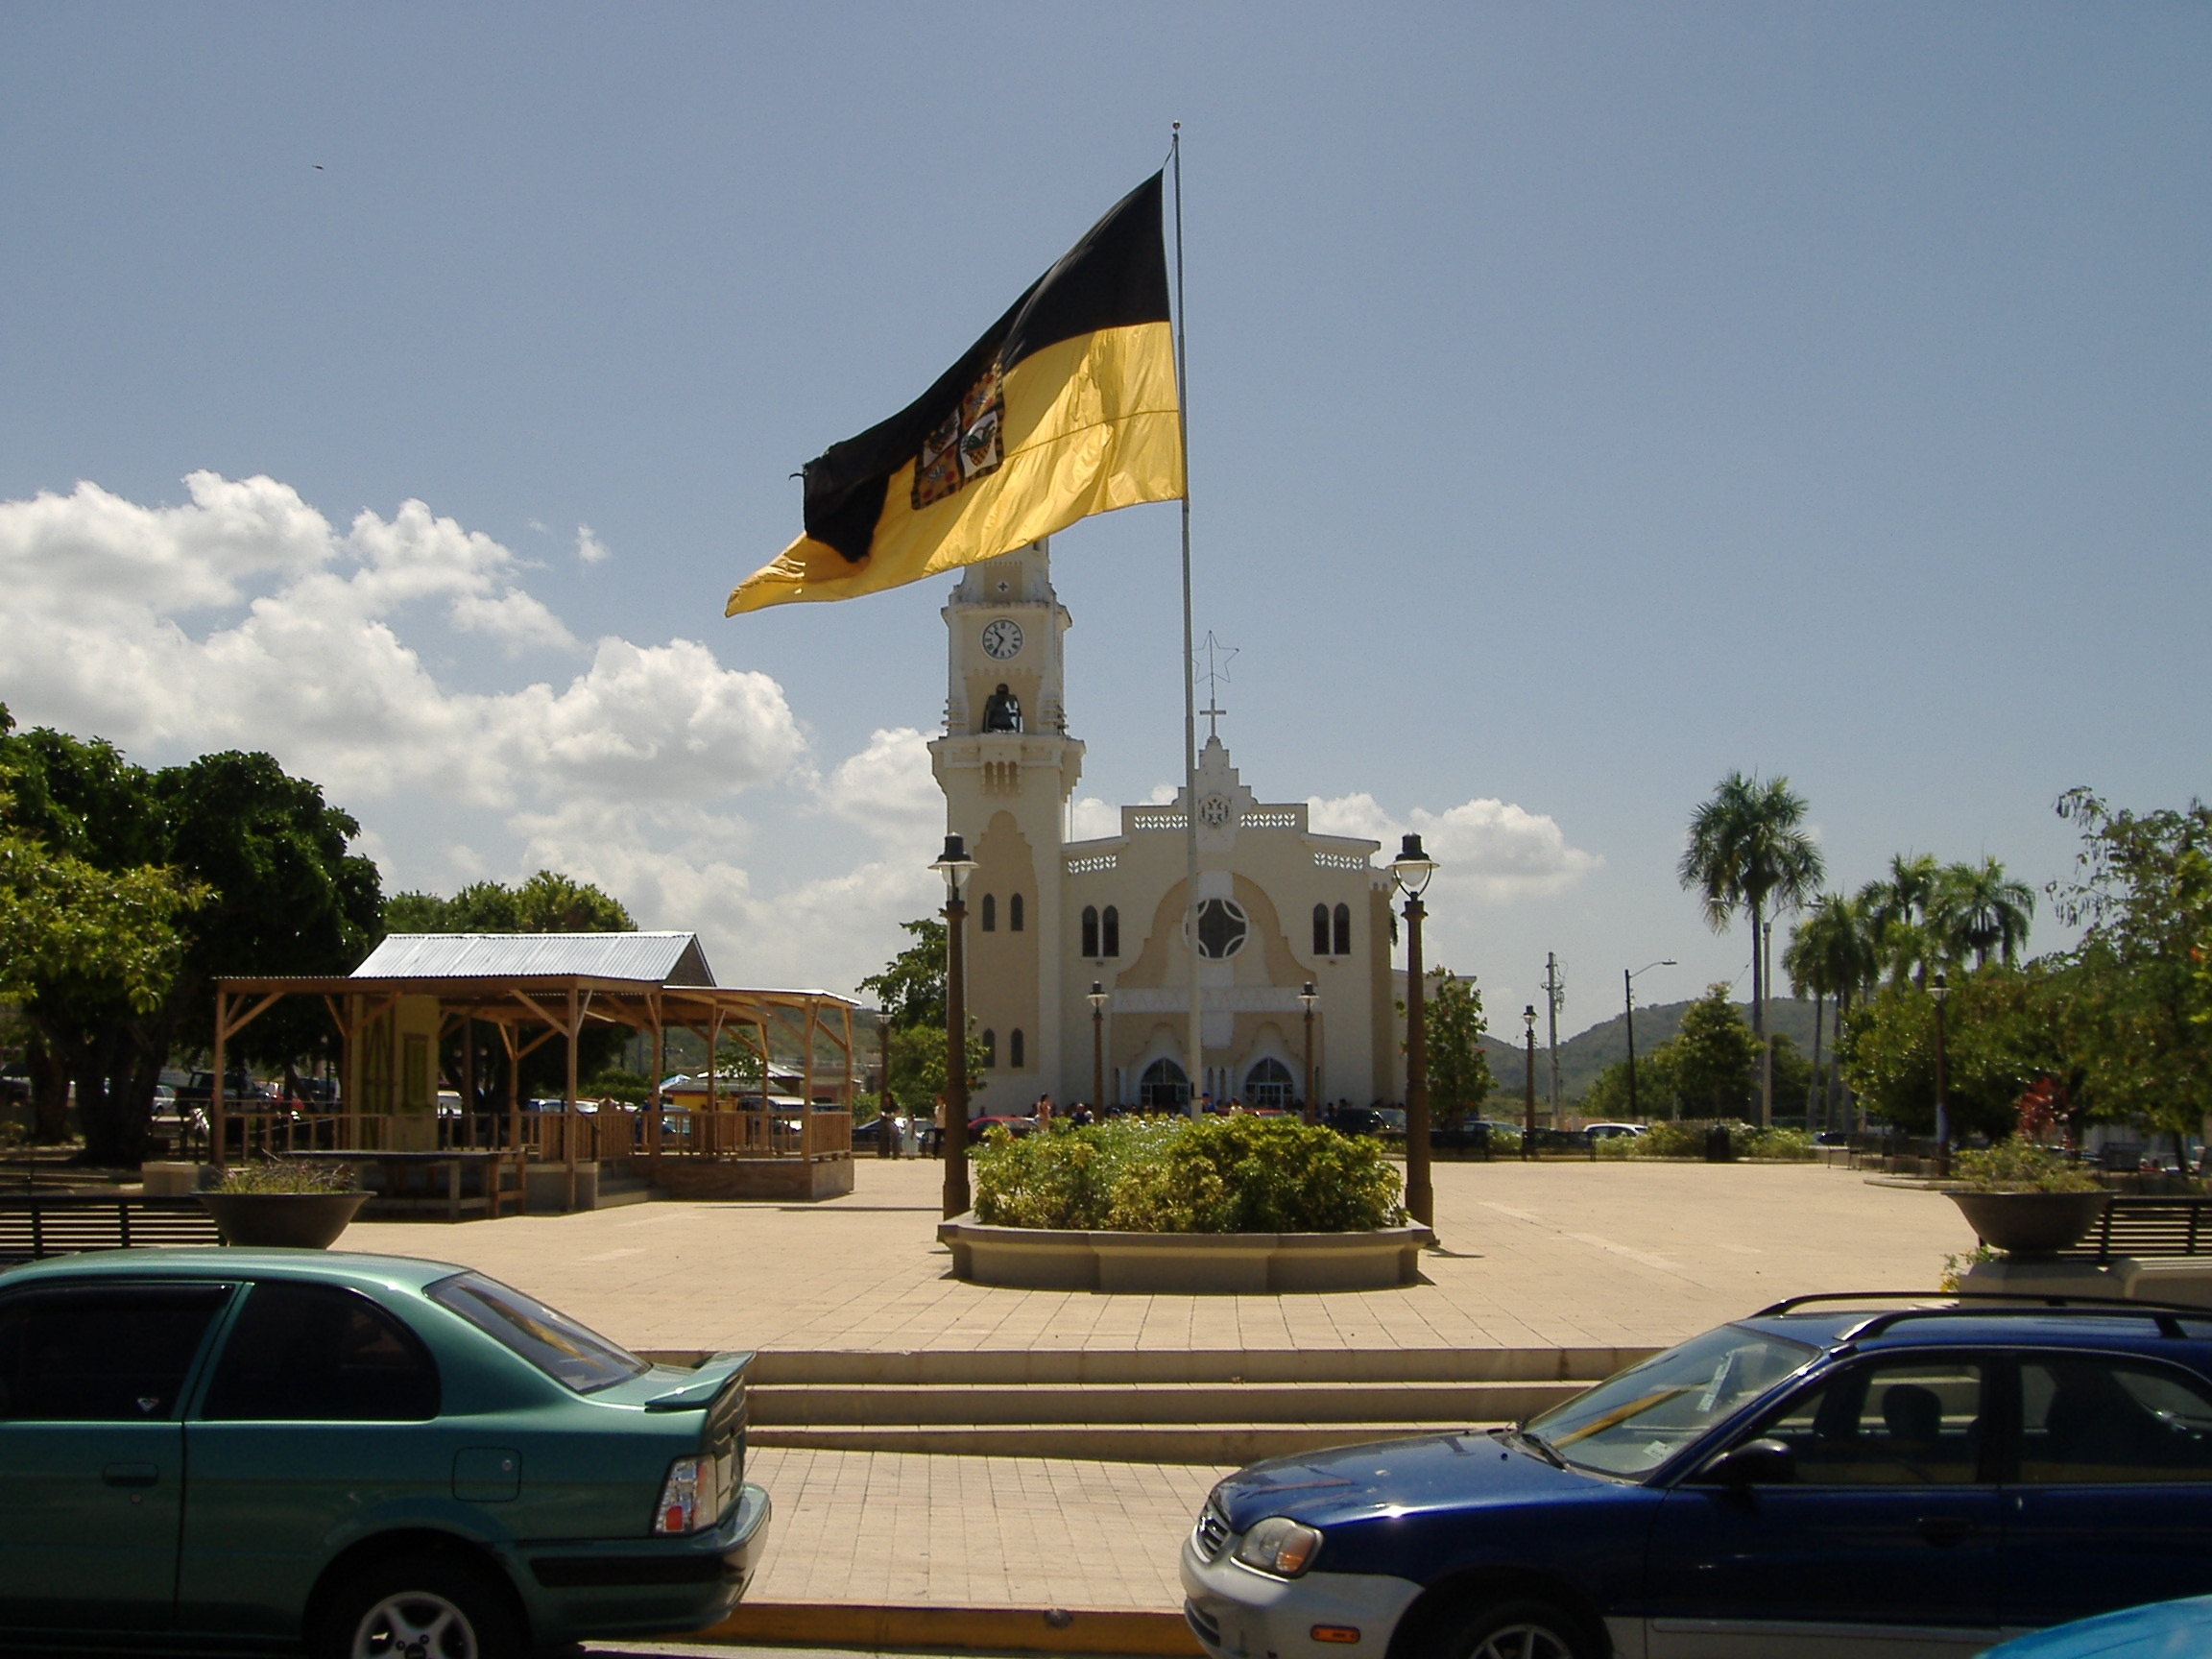 Casas reposeidas en puerto rico banco popular en bayamon